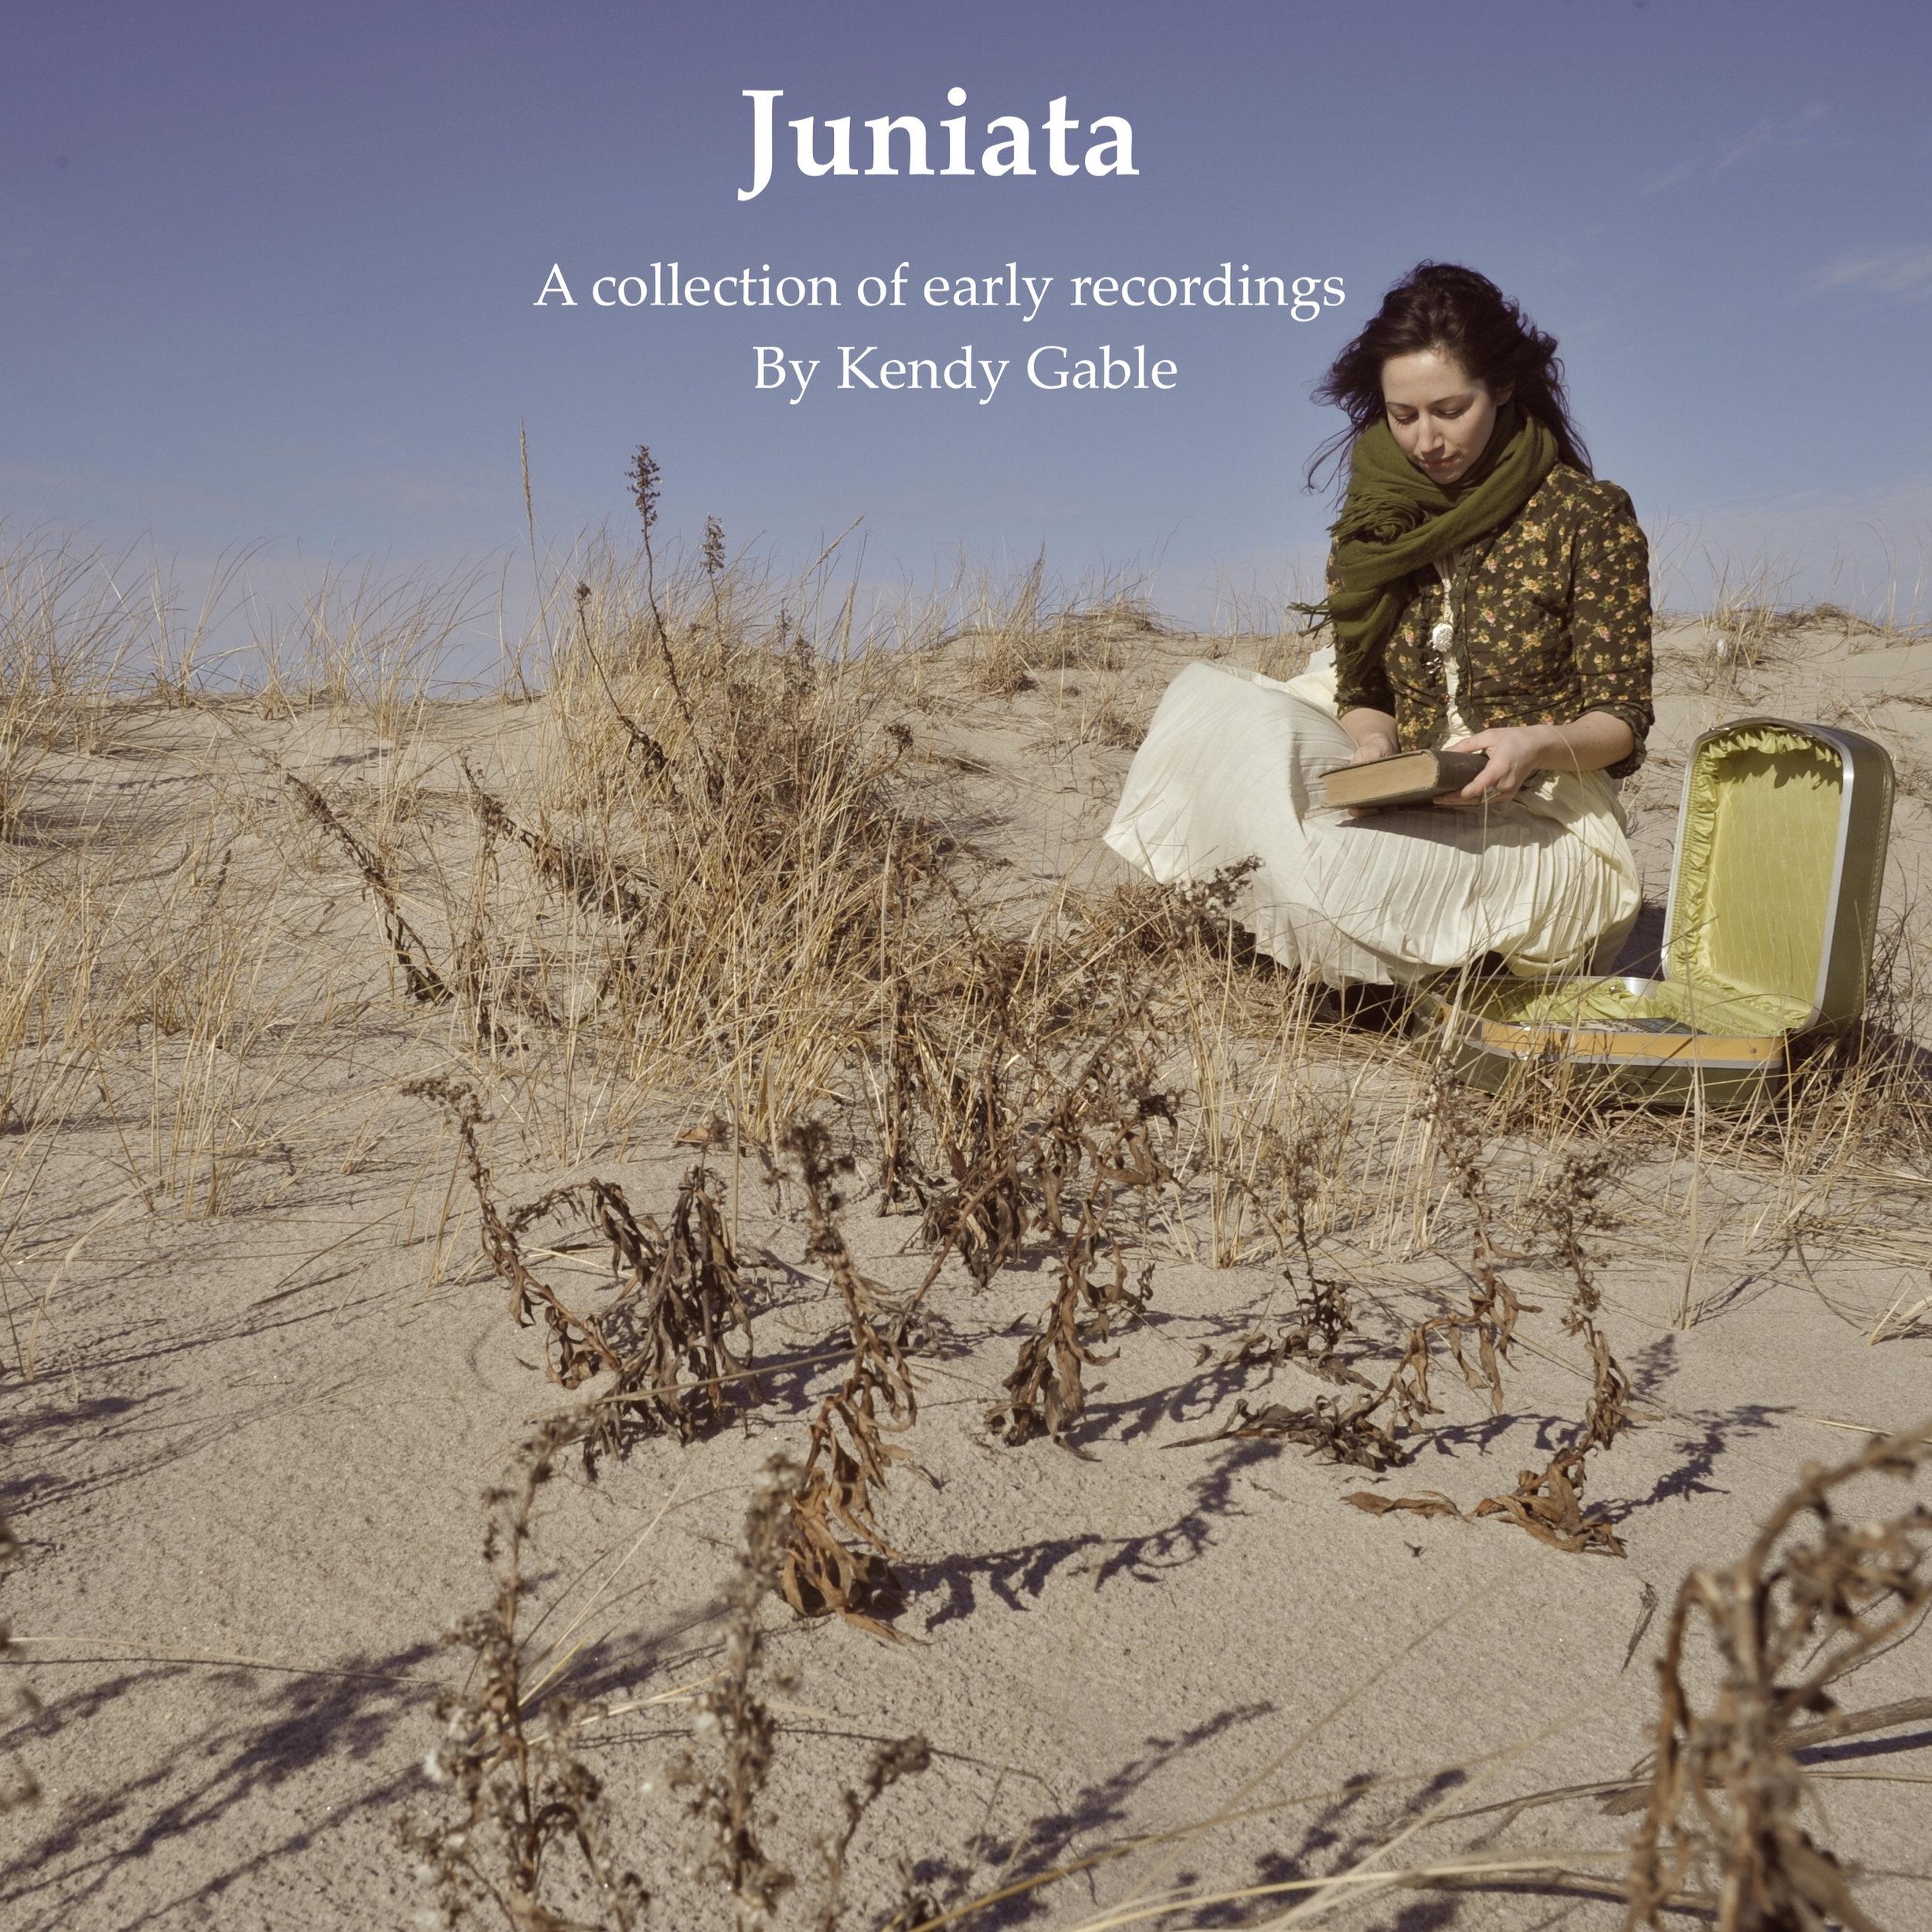 juniata cover.jpg